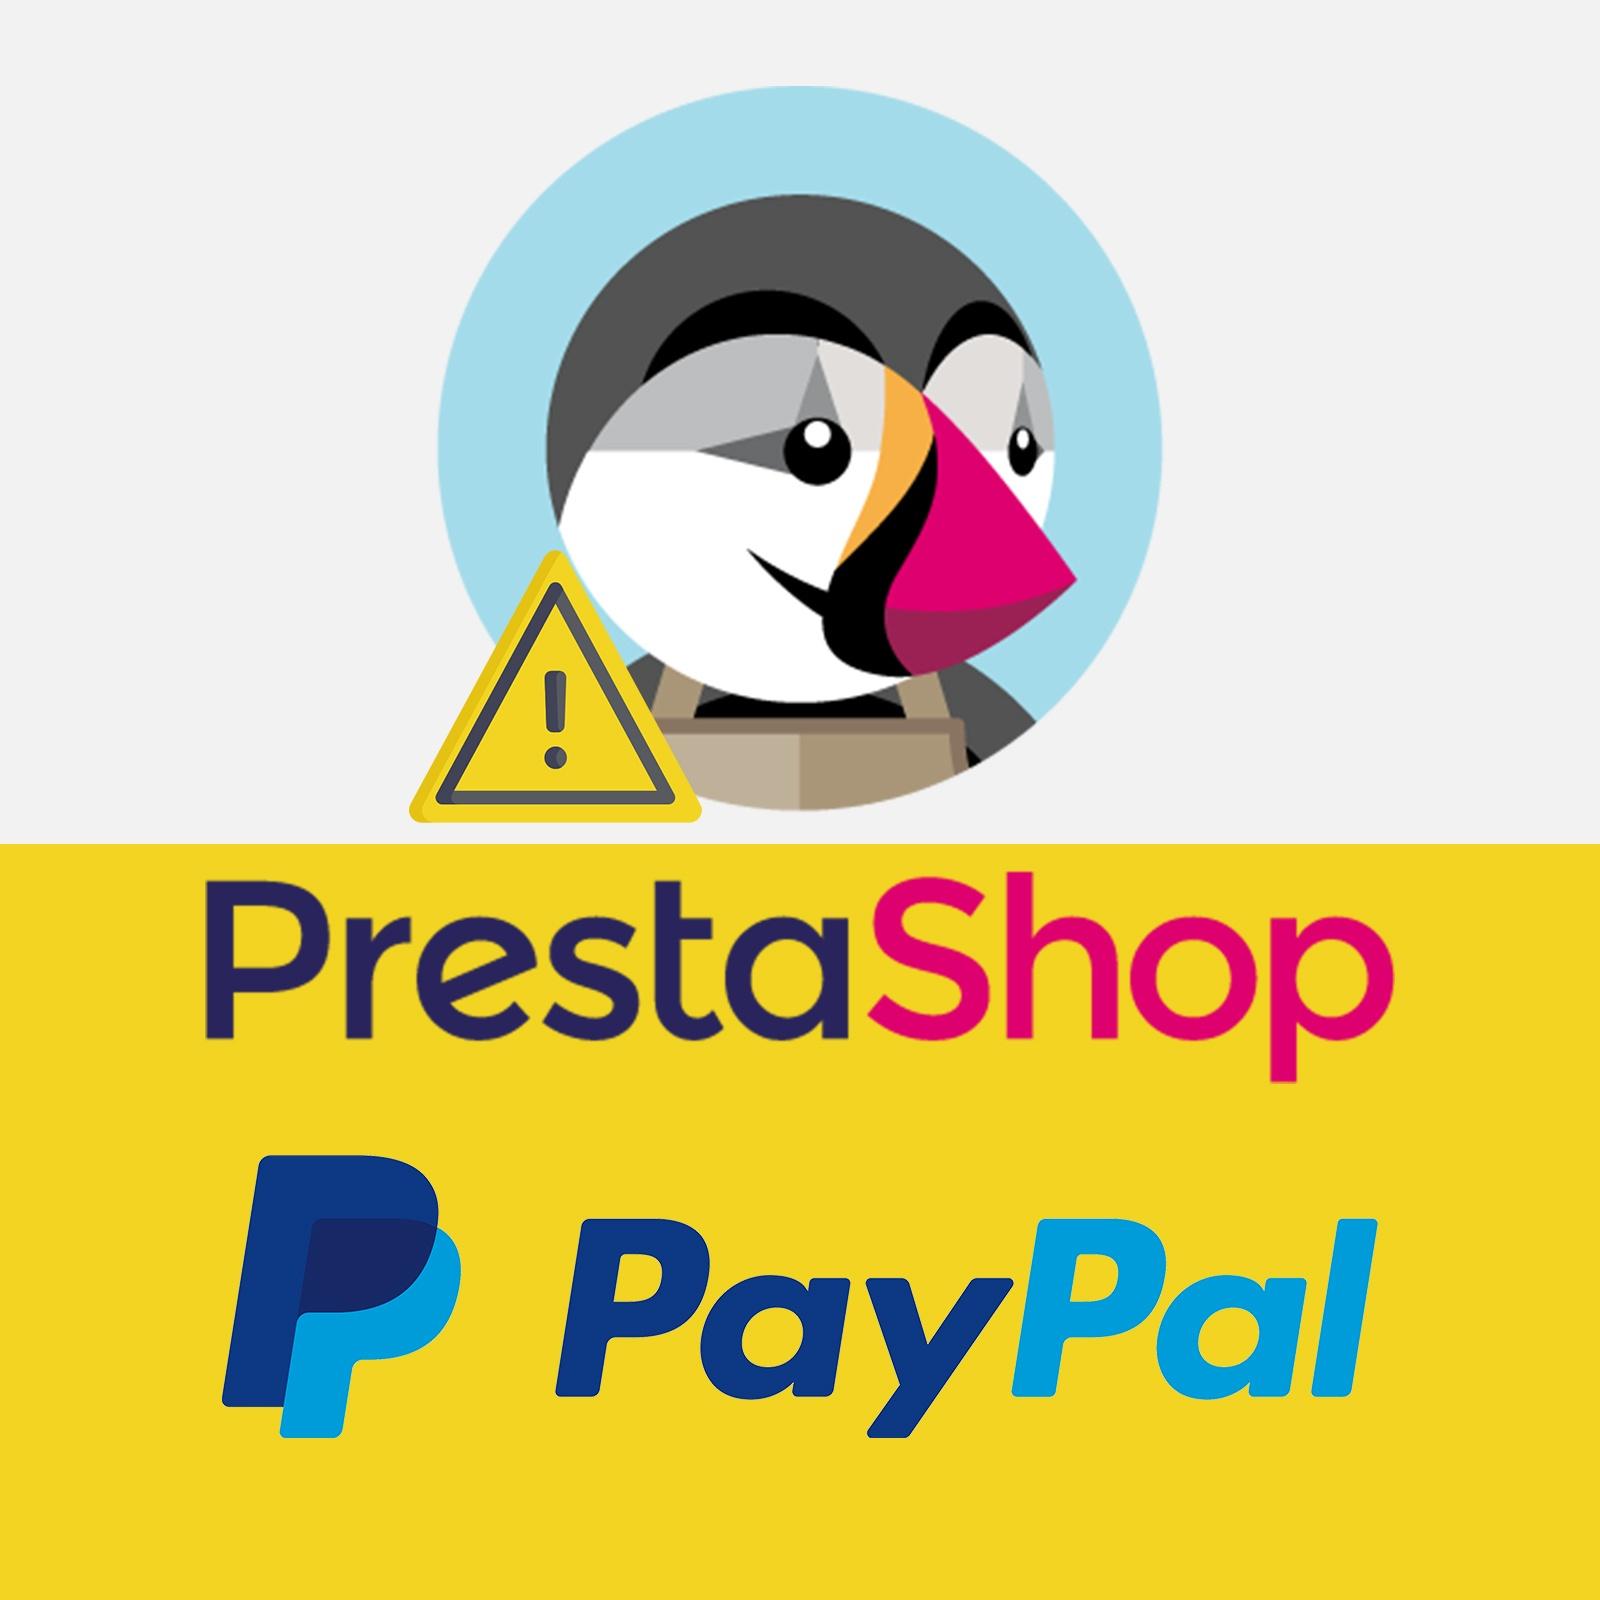 Prestashop Paypal module. Price rounding error in Paypal. Prestashop payment error by Paypal. Prestashop product amount rounding error.